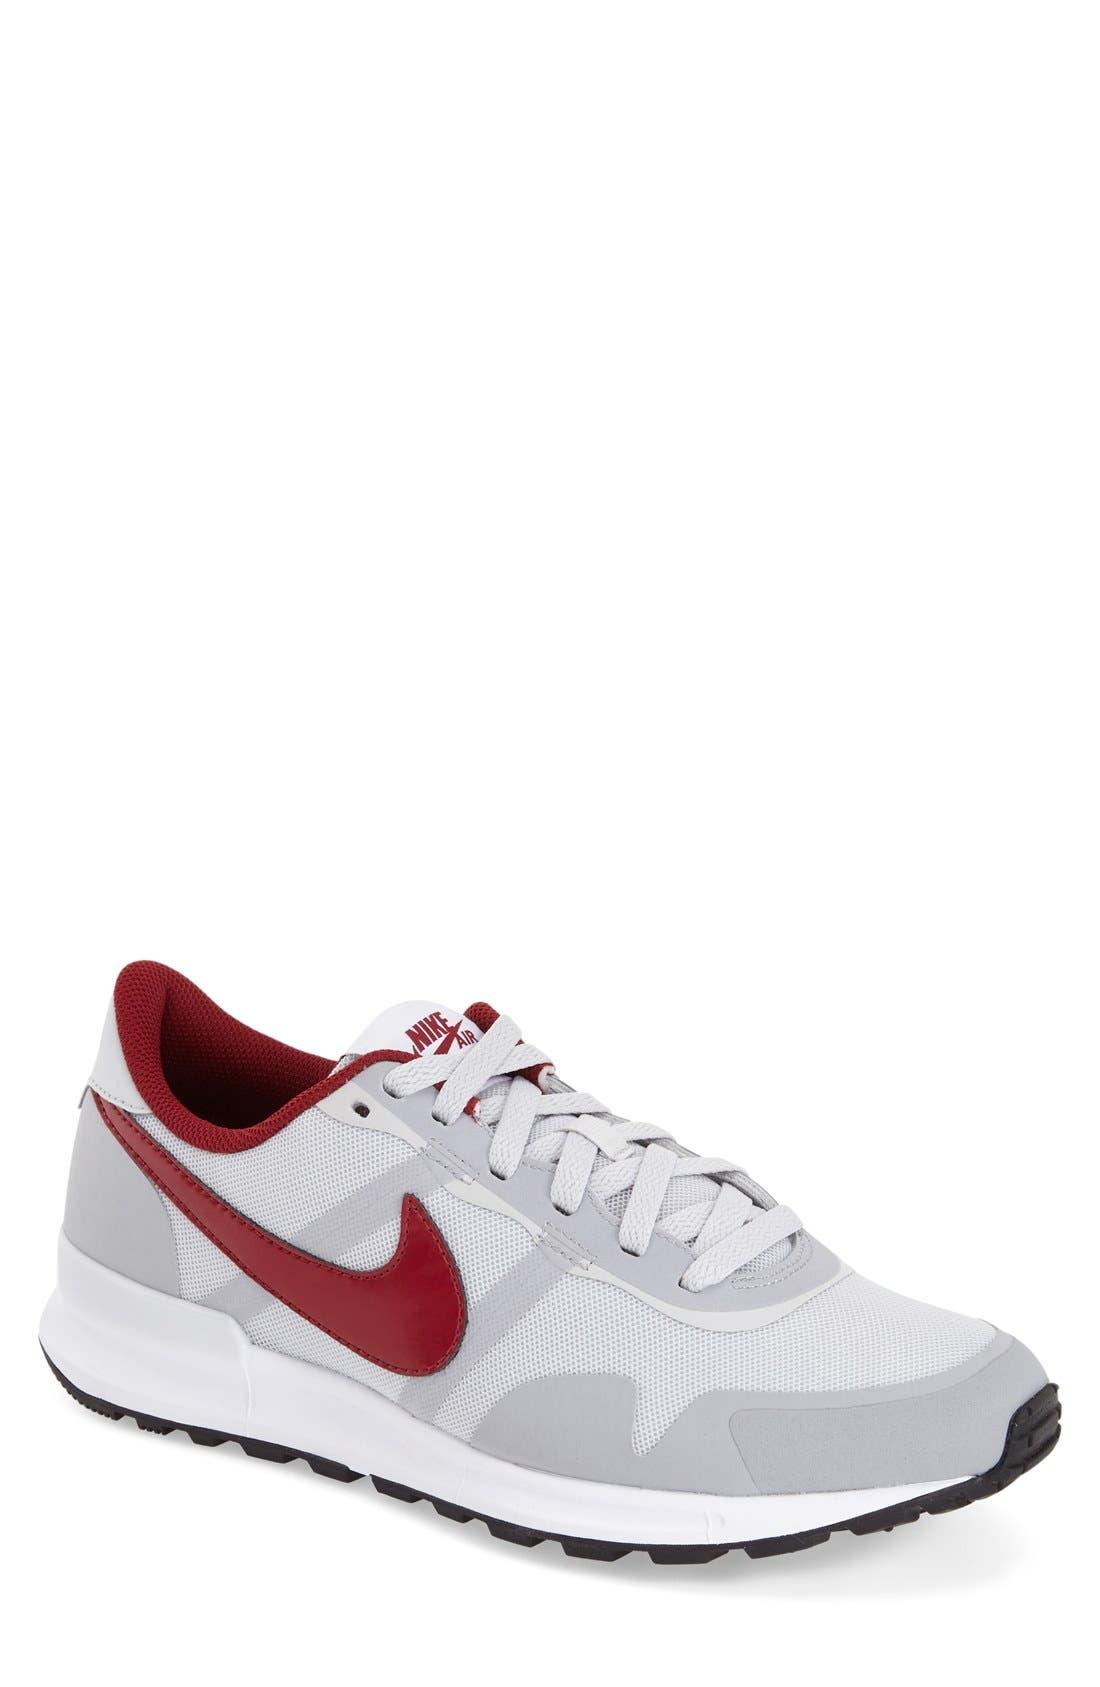 uk availability 3073c c14e2 Amazing Colours Of Nike Free Runs | Parallax Inc